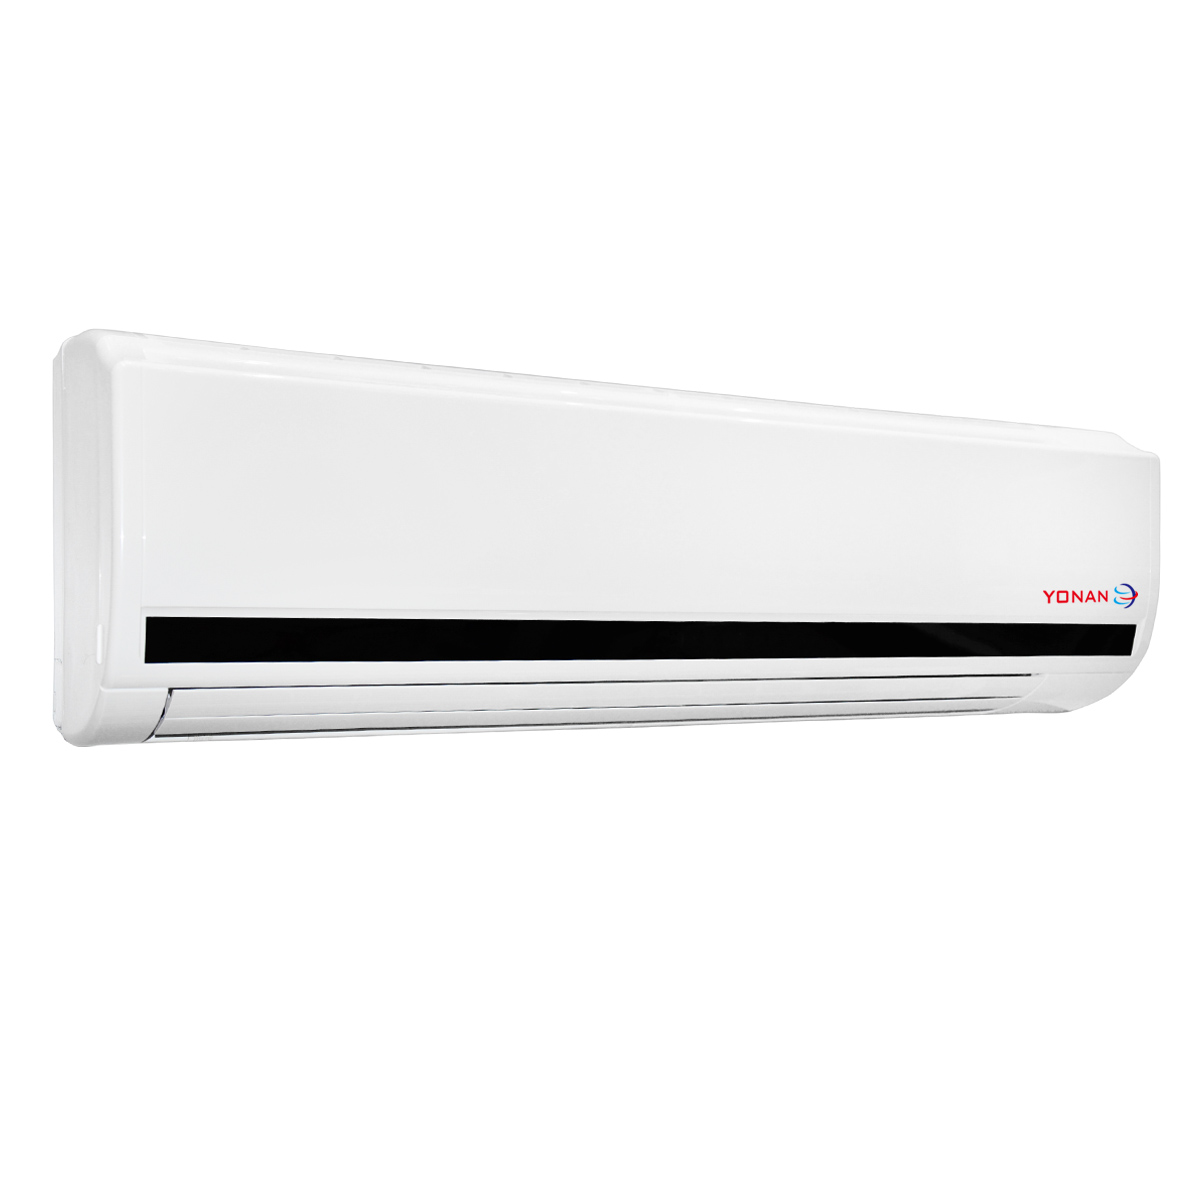 AIR CONDITIONER Split Wall Air Conditioner 30000 BTU